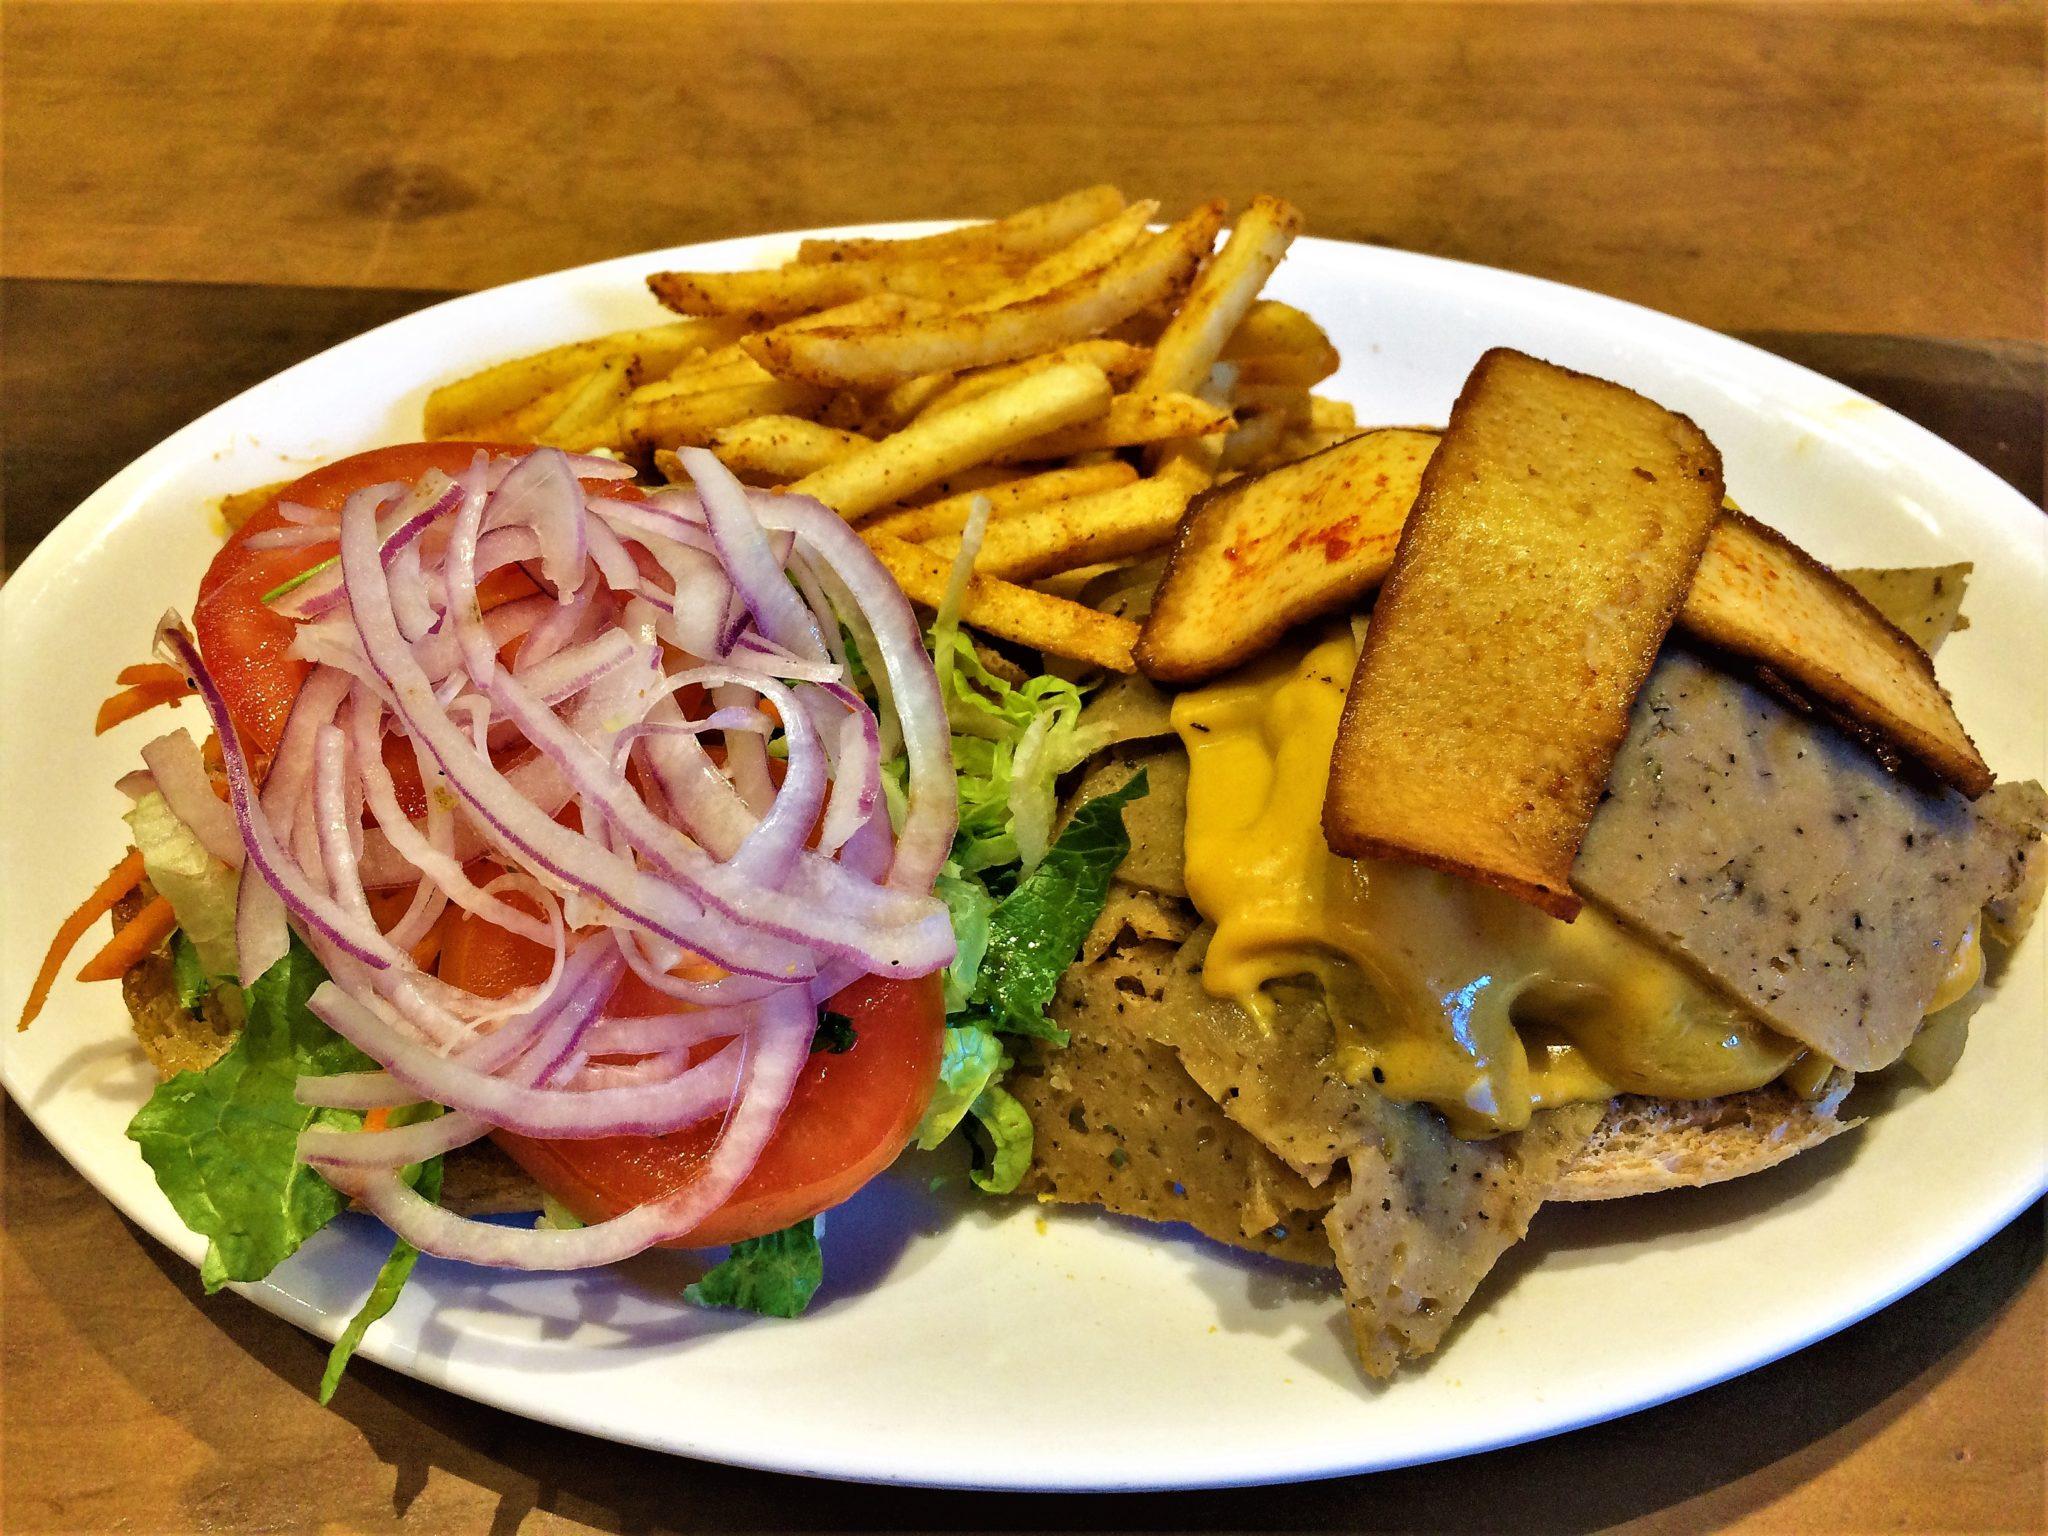 Vegan sandwich at Native food cafe, Palm Springs, California